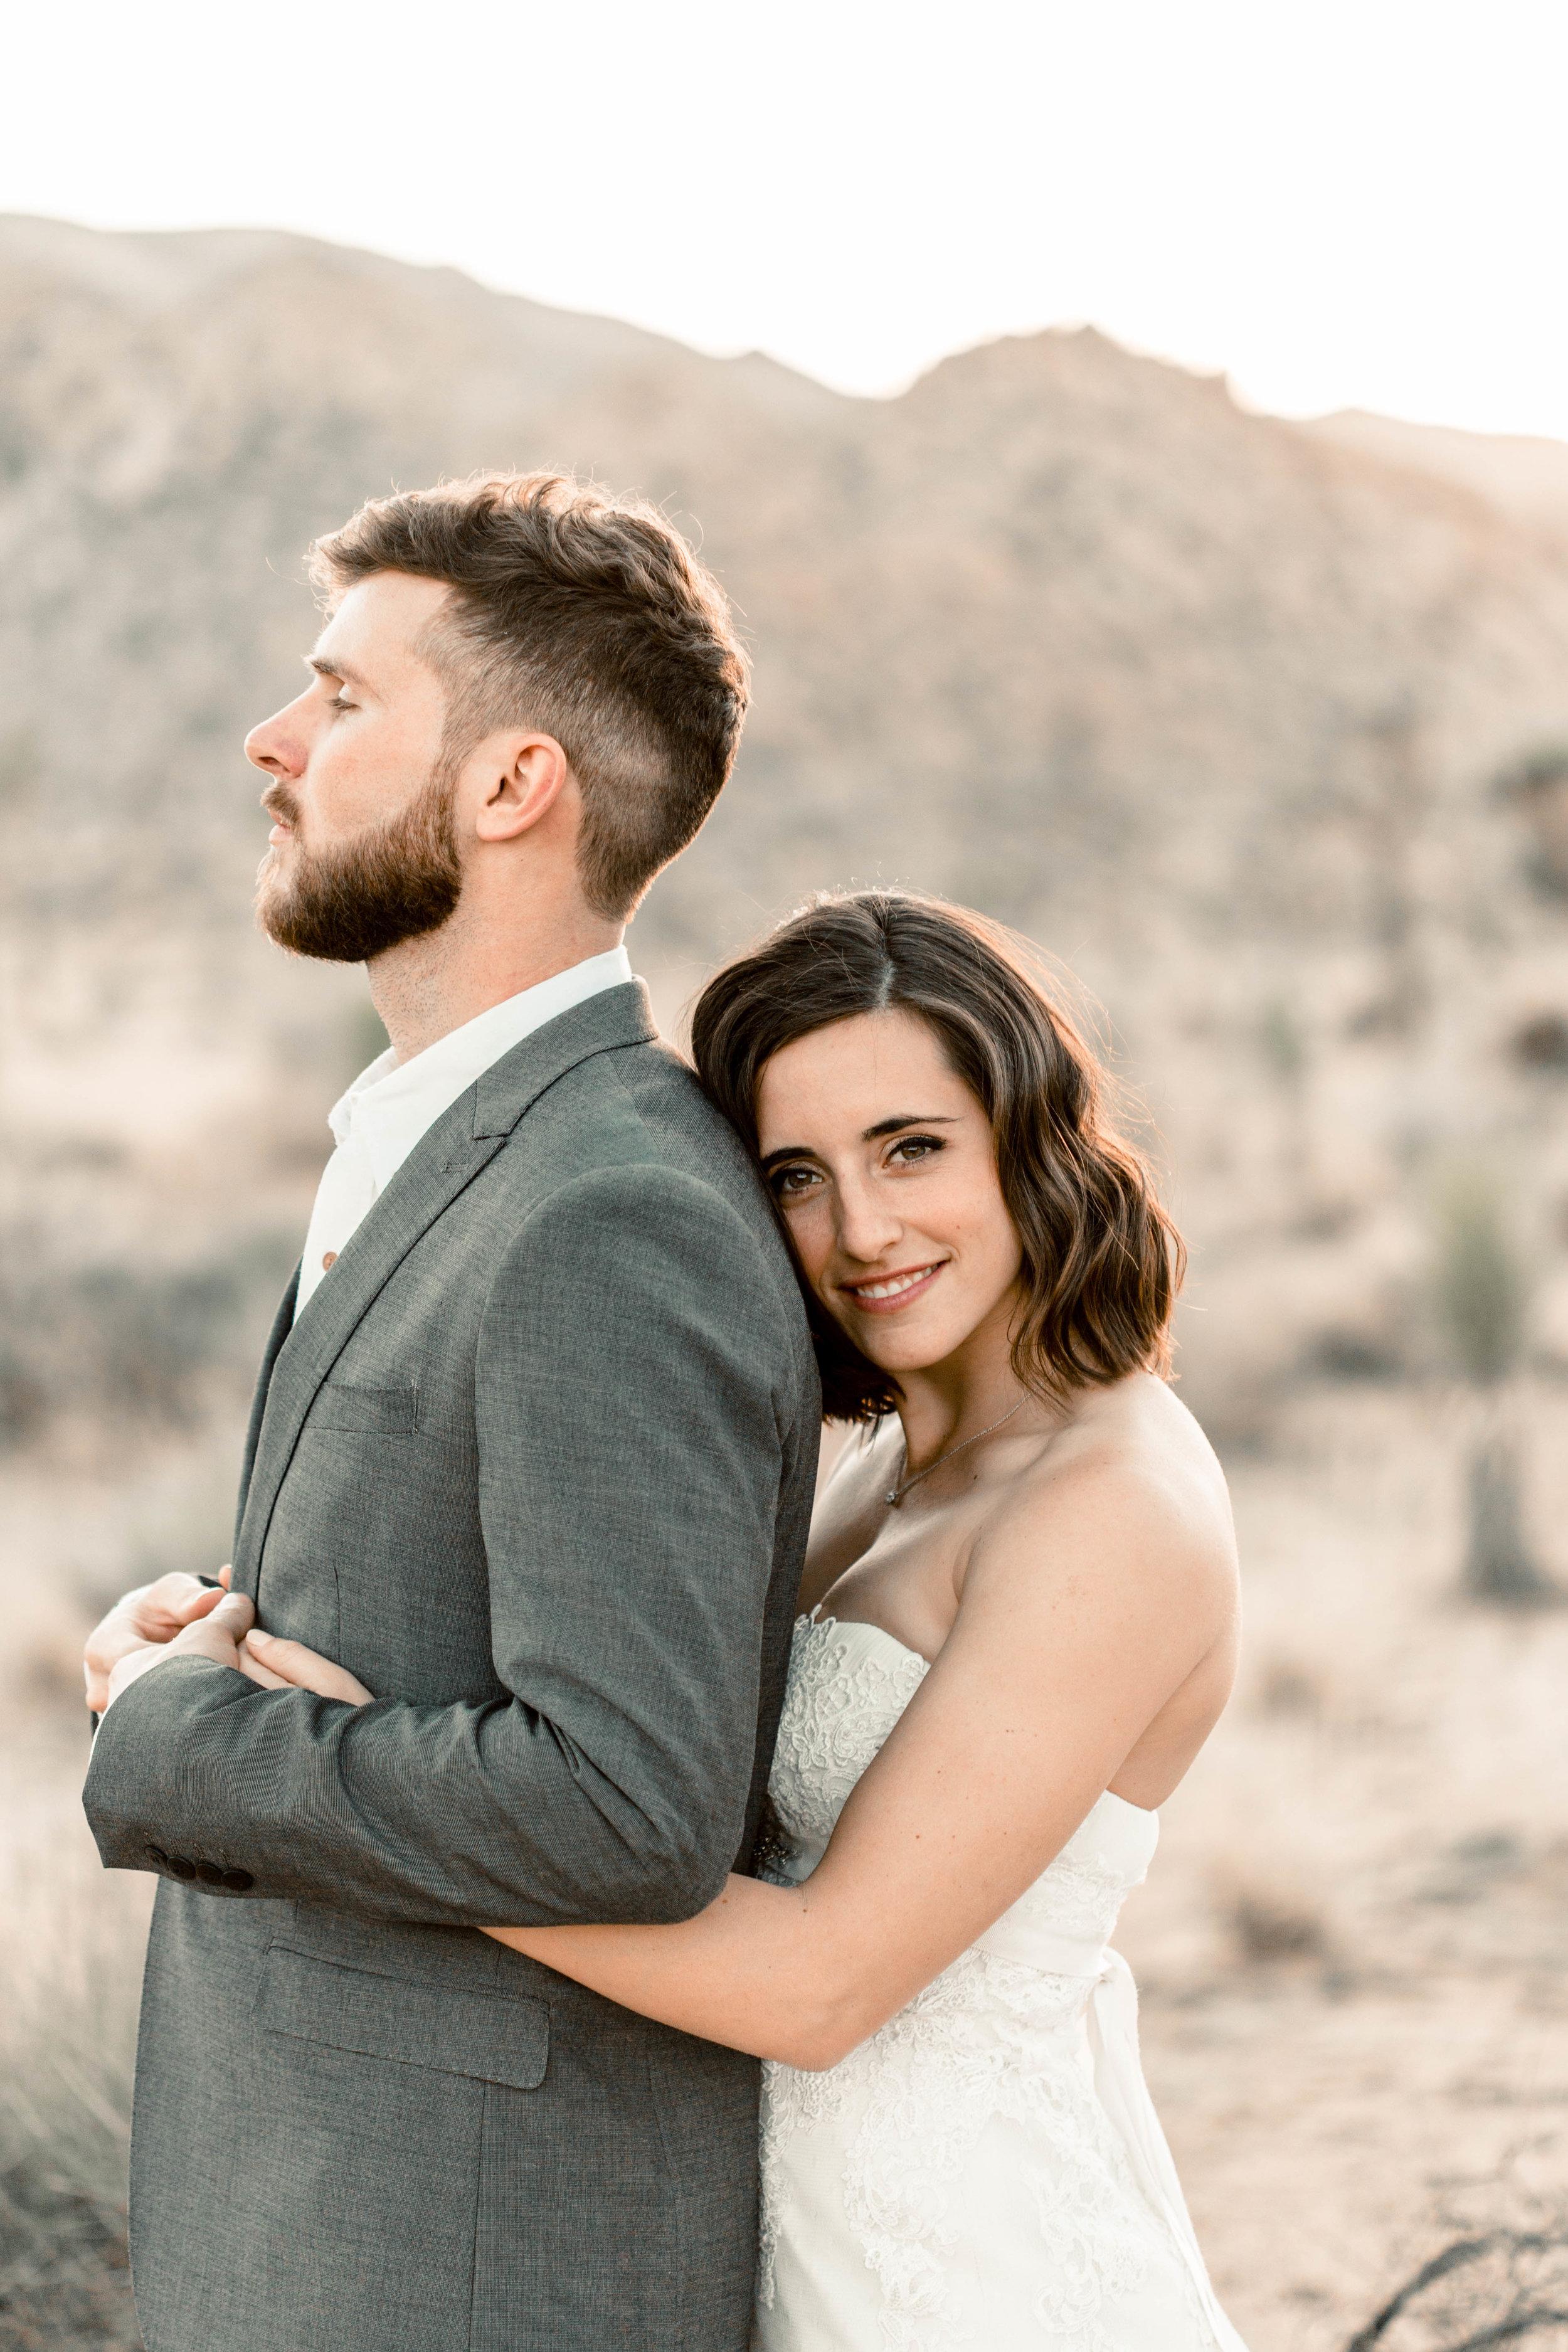 nicole-daacke-photography-joshua-tree-adventurous-elopement-wedding-national-park-wedding-photographer-adventure-wedding-adventurous-elopement-jtree-joshua-tree-national-park-wedding-photographer-intimate-weddings-golden-desert-love-33.jpg